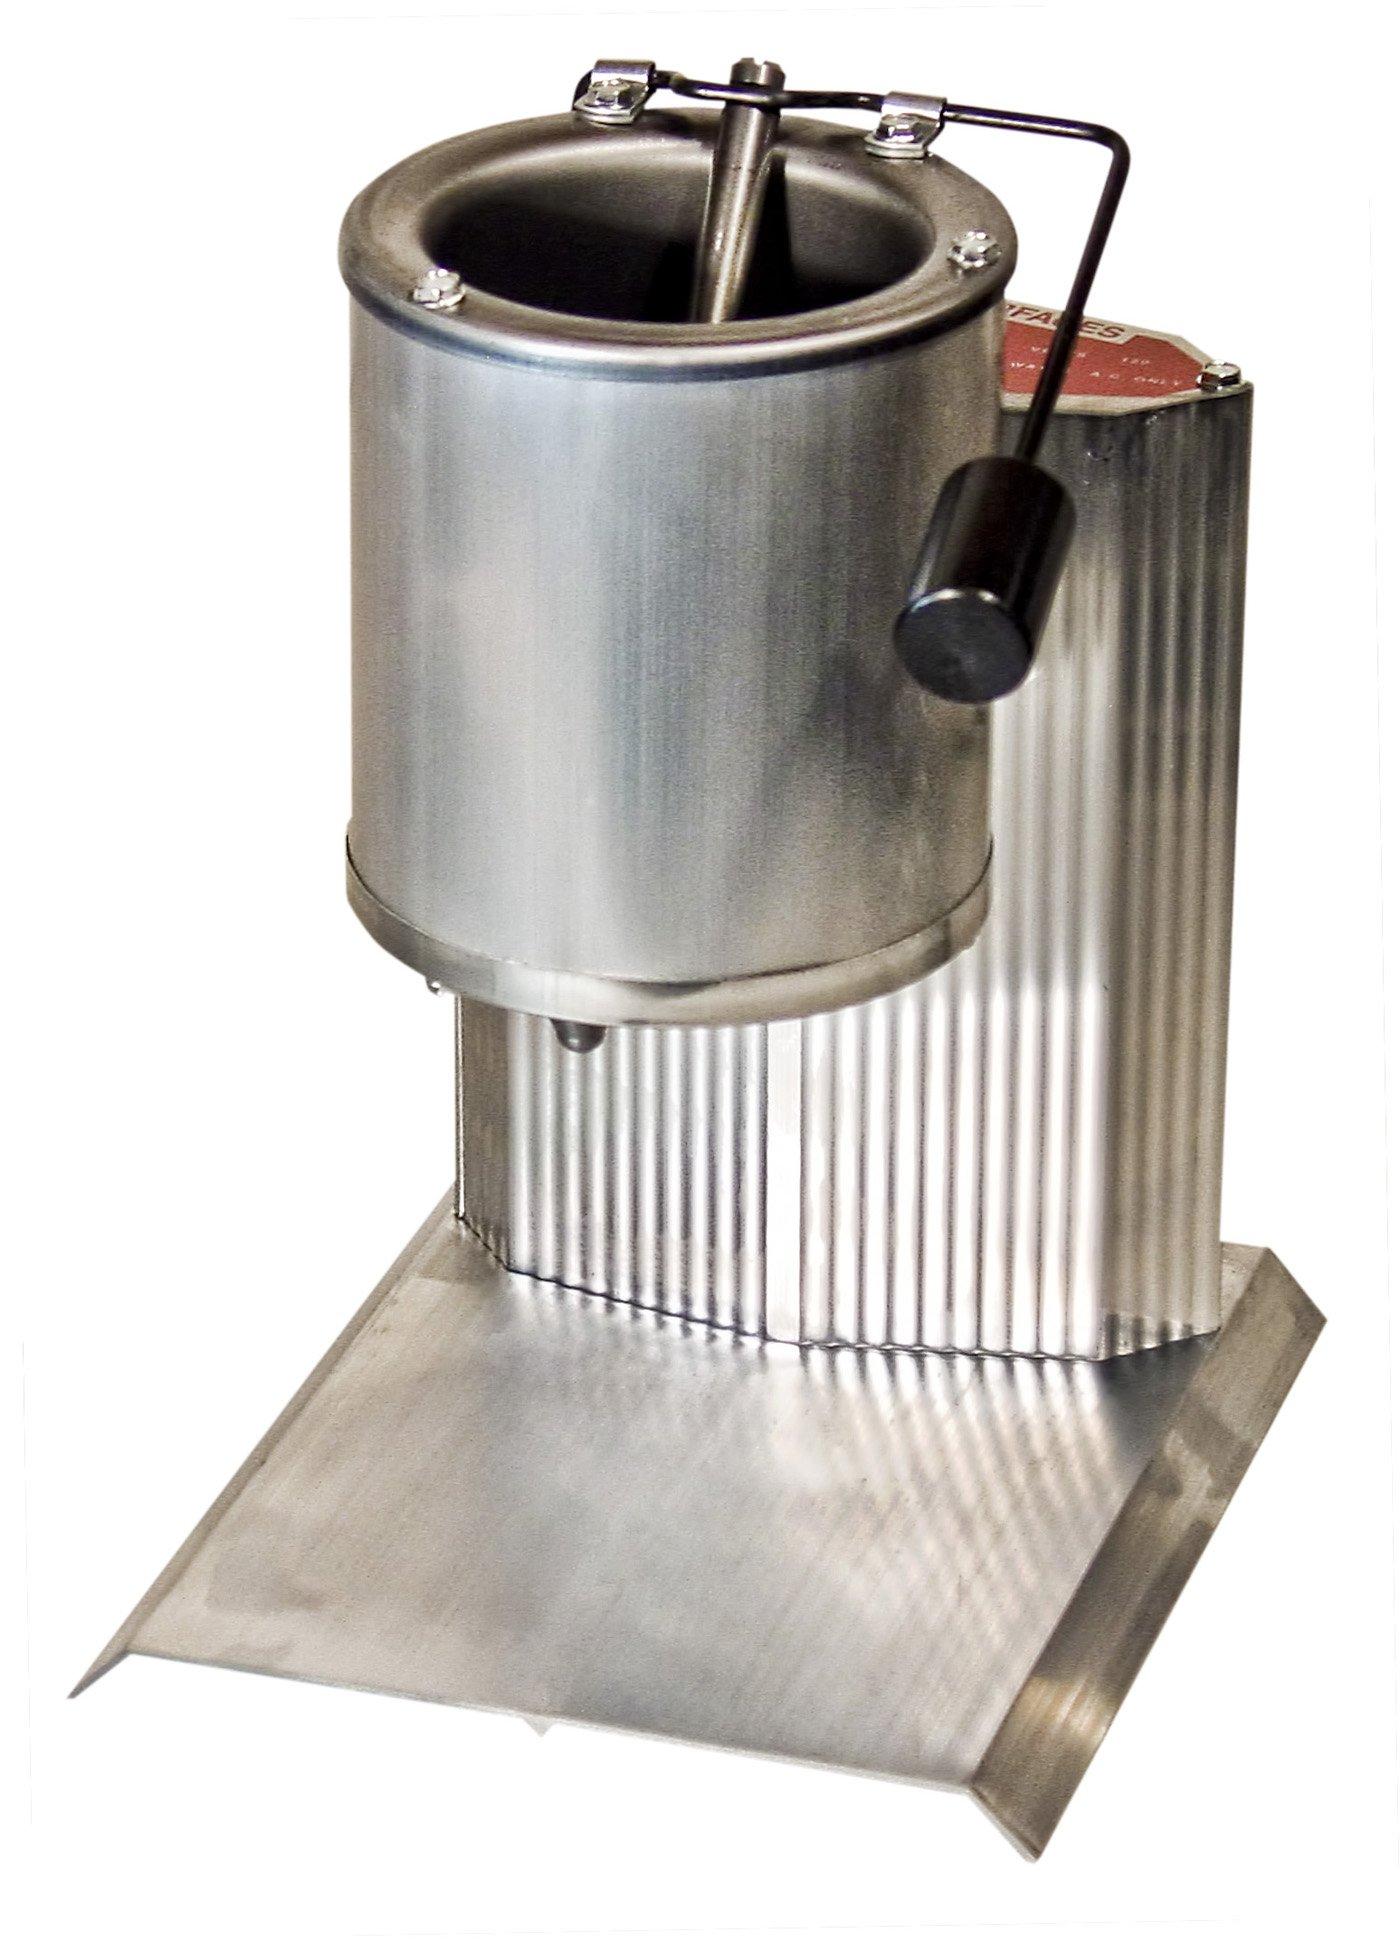 LEE PRECISION Production Pot IV (Grey)